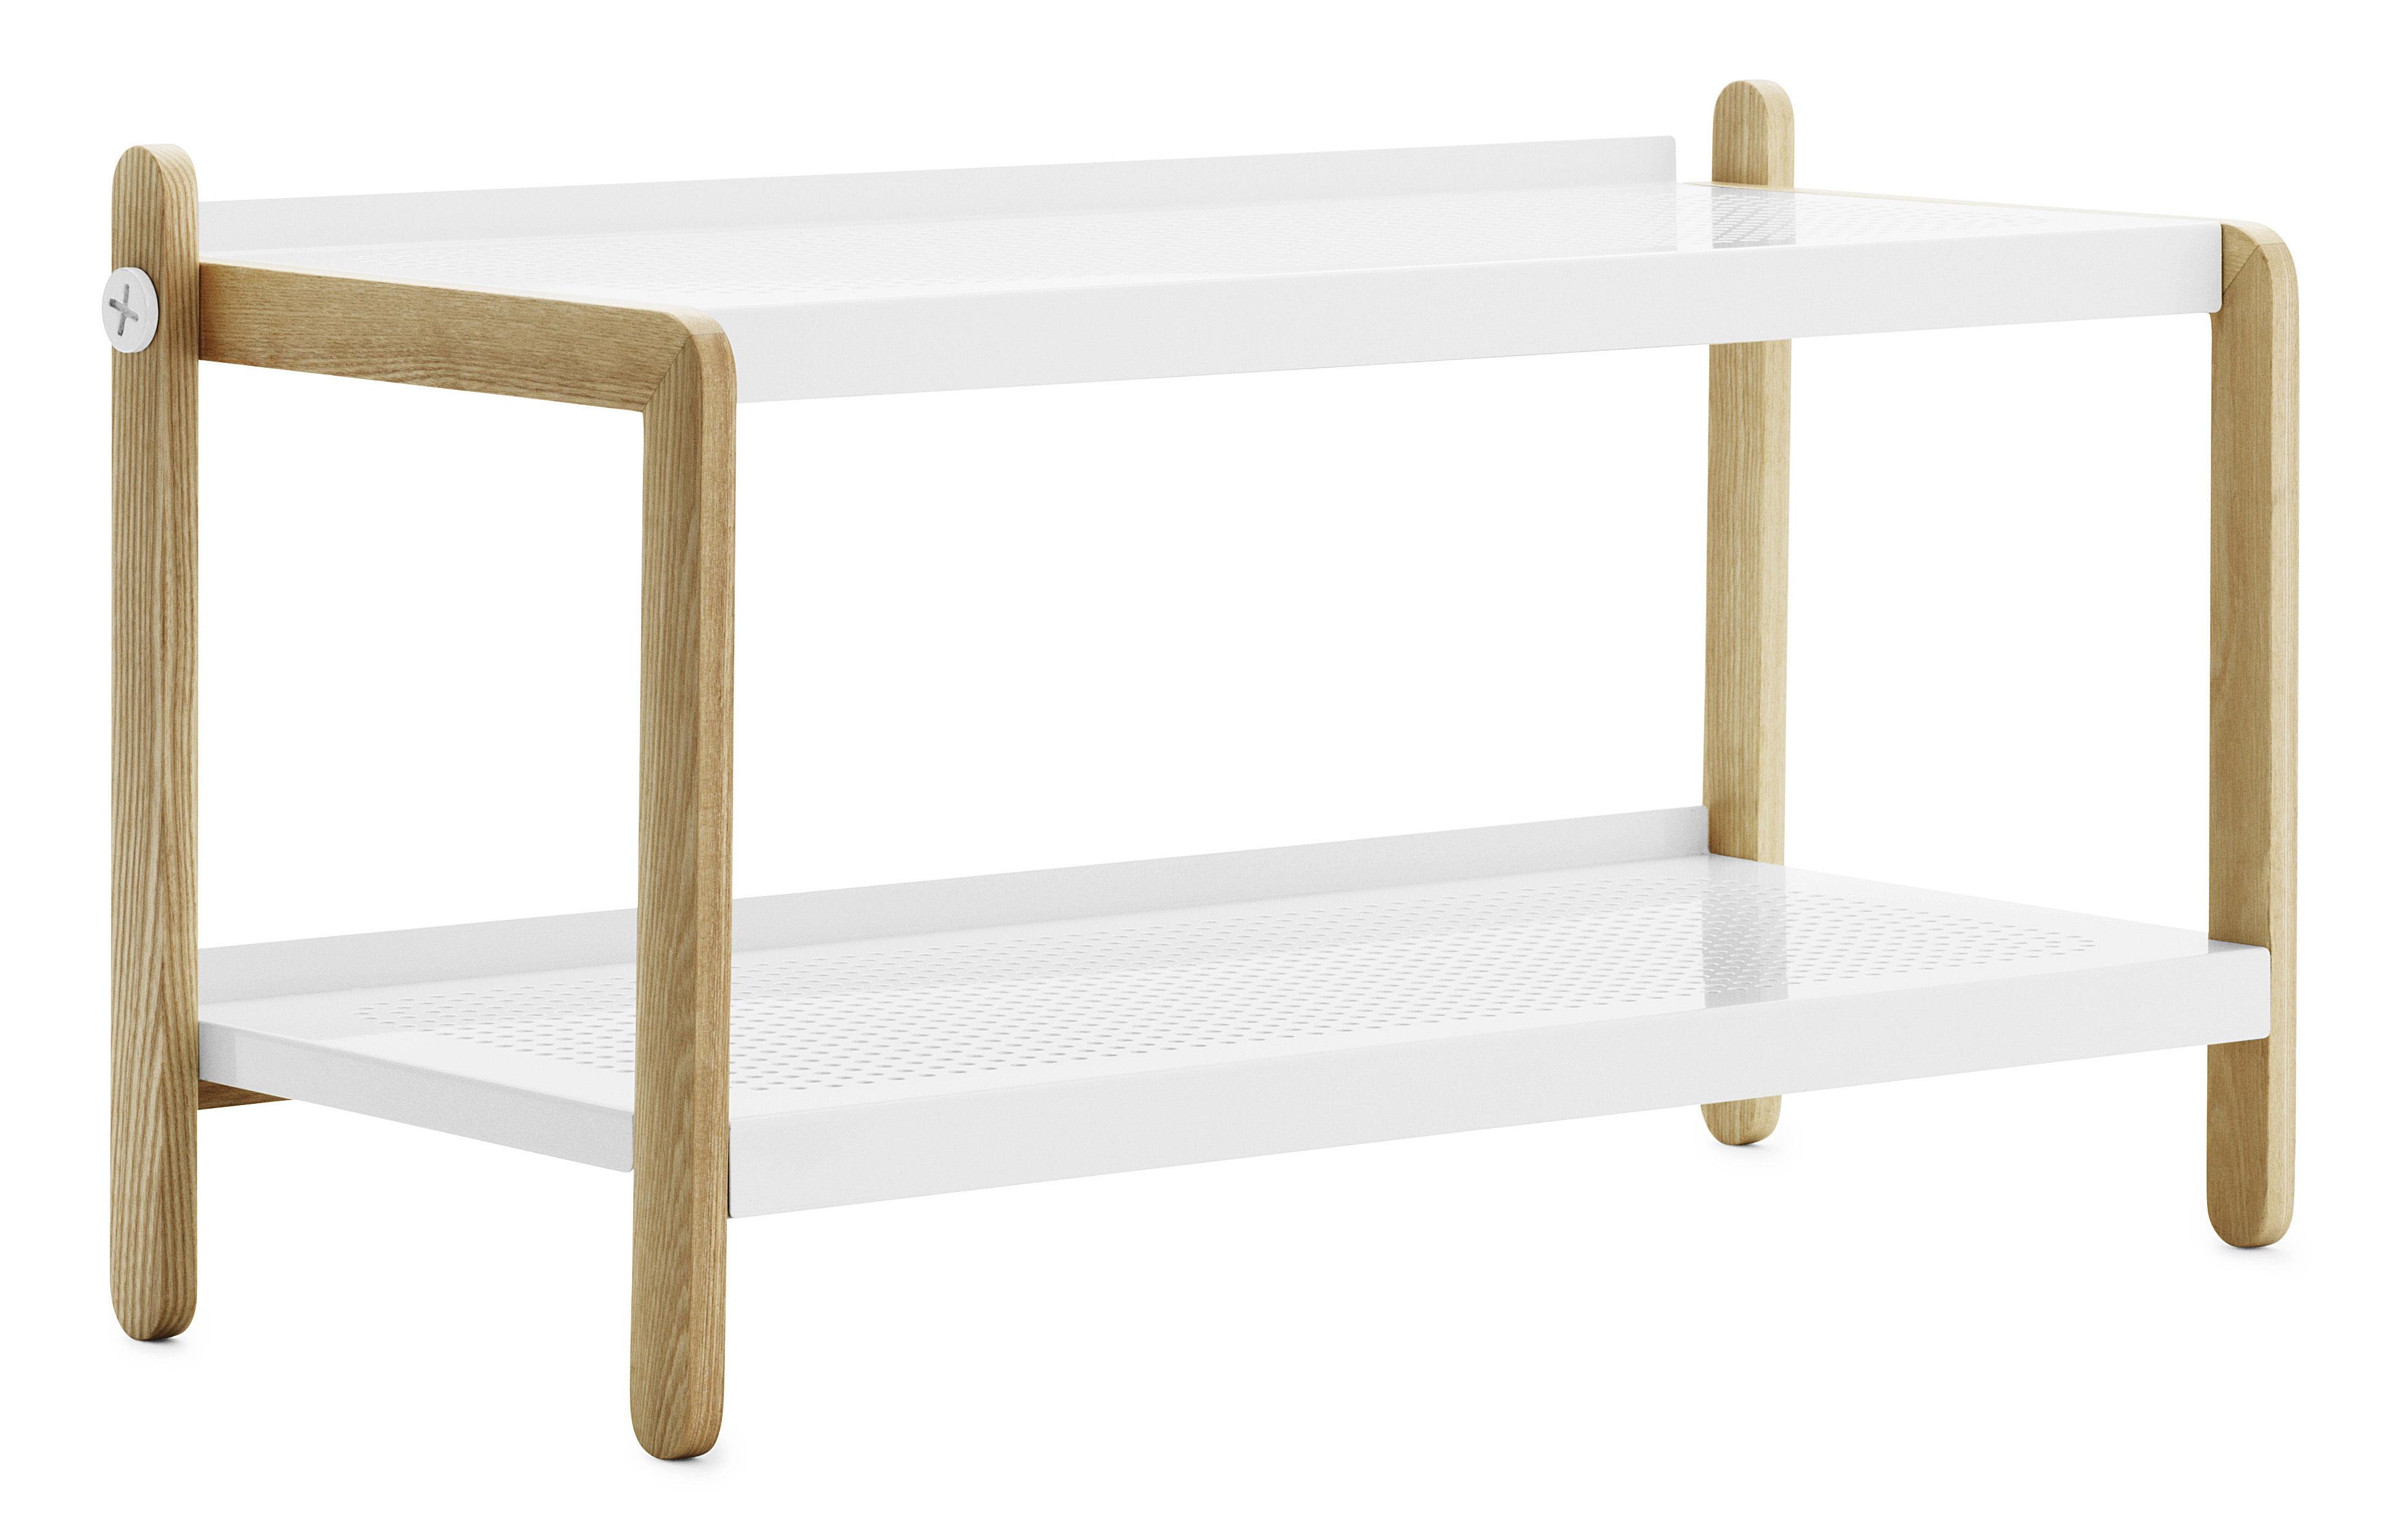 c80c385cde69 ... Furniture - Shelves   Storage Furniture - Sko Shoe rack by Normann  Copenhagen - White -